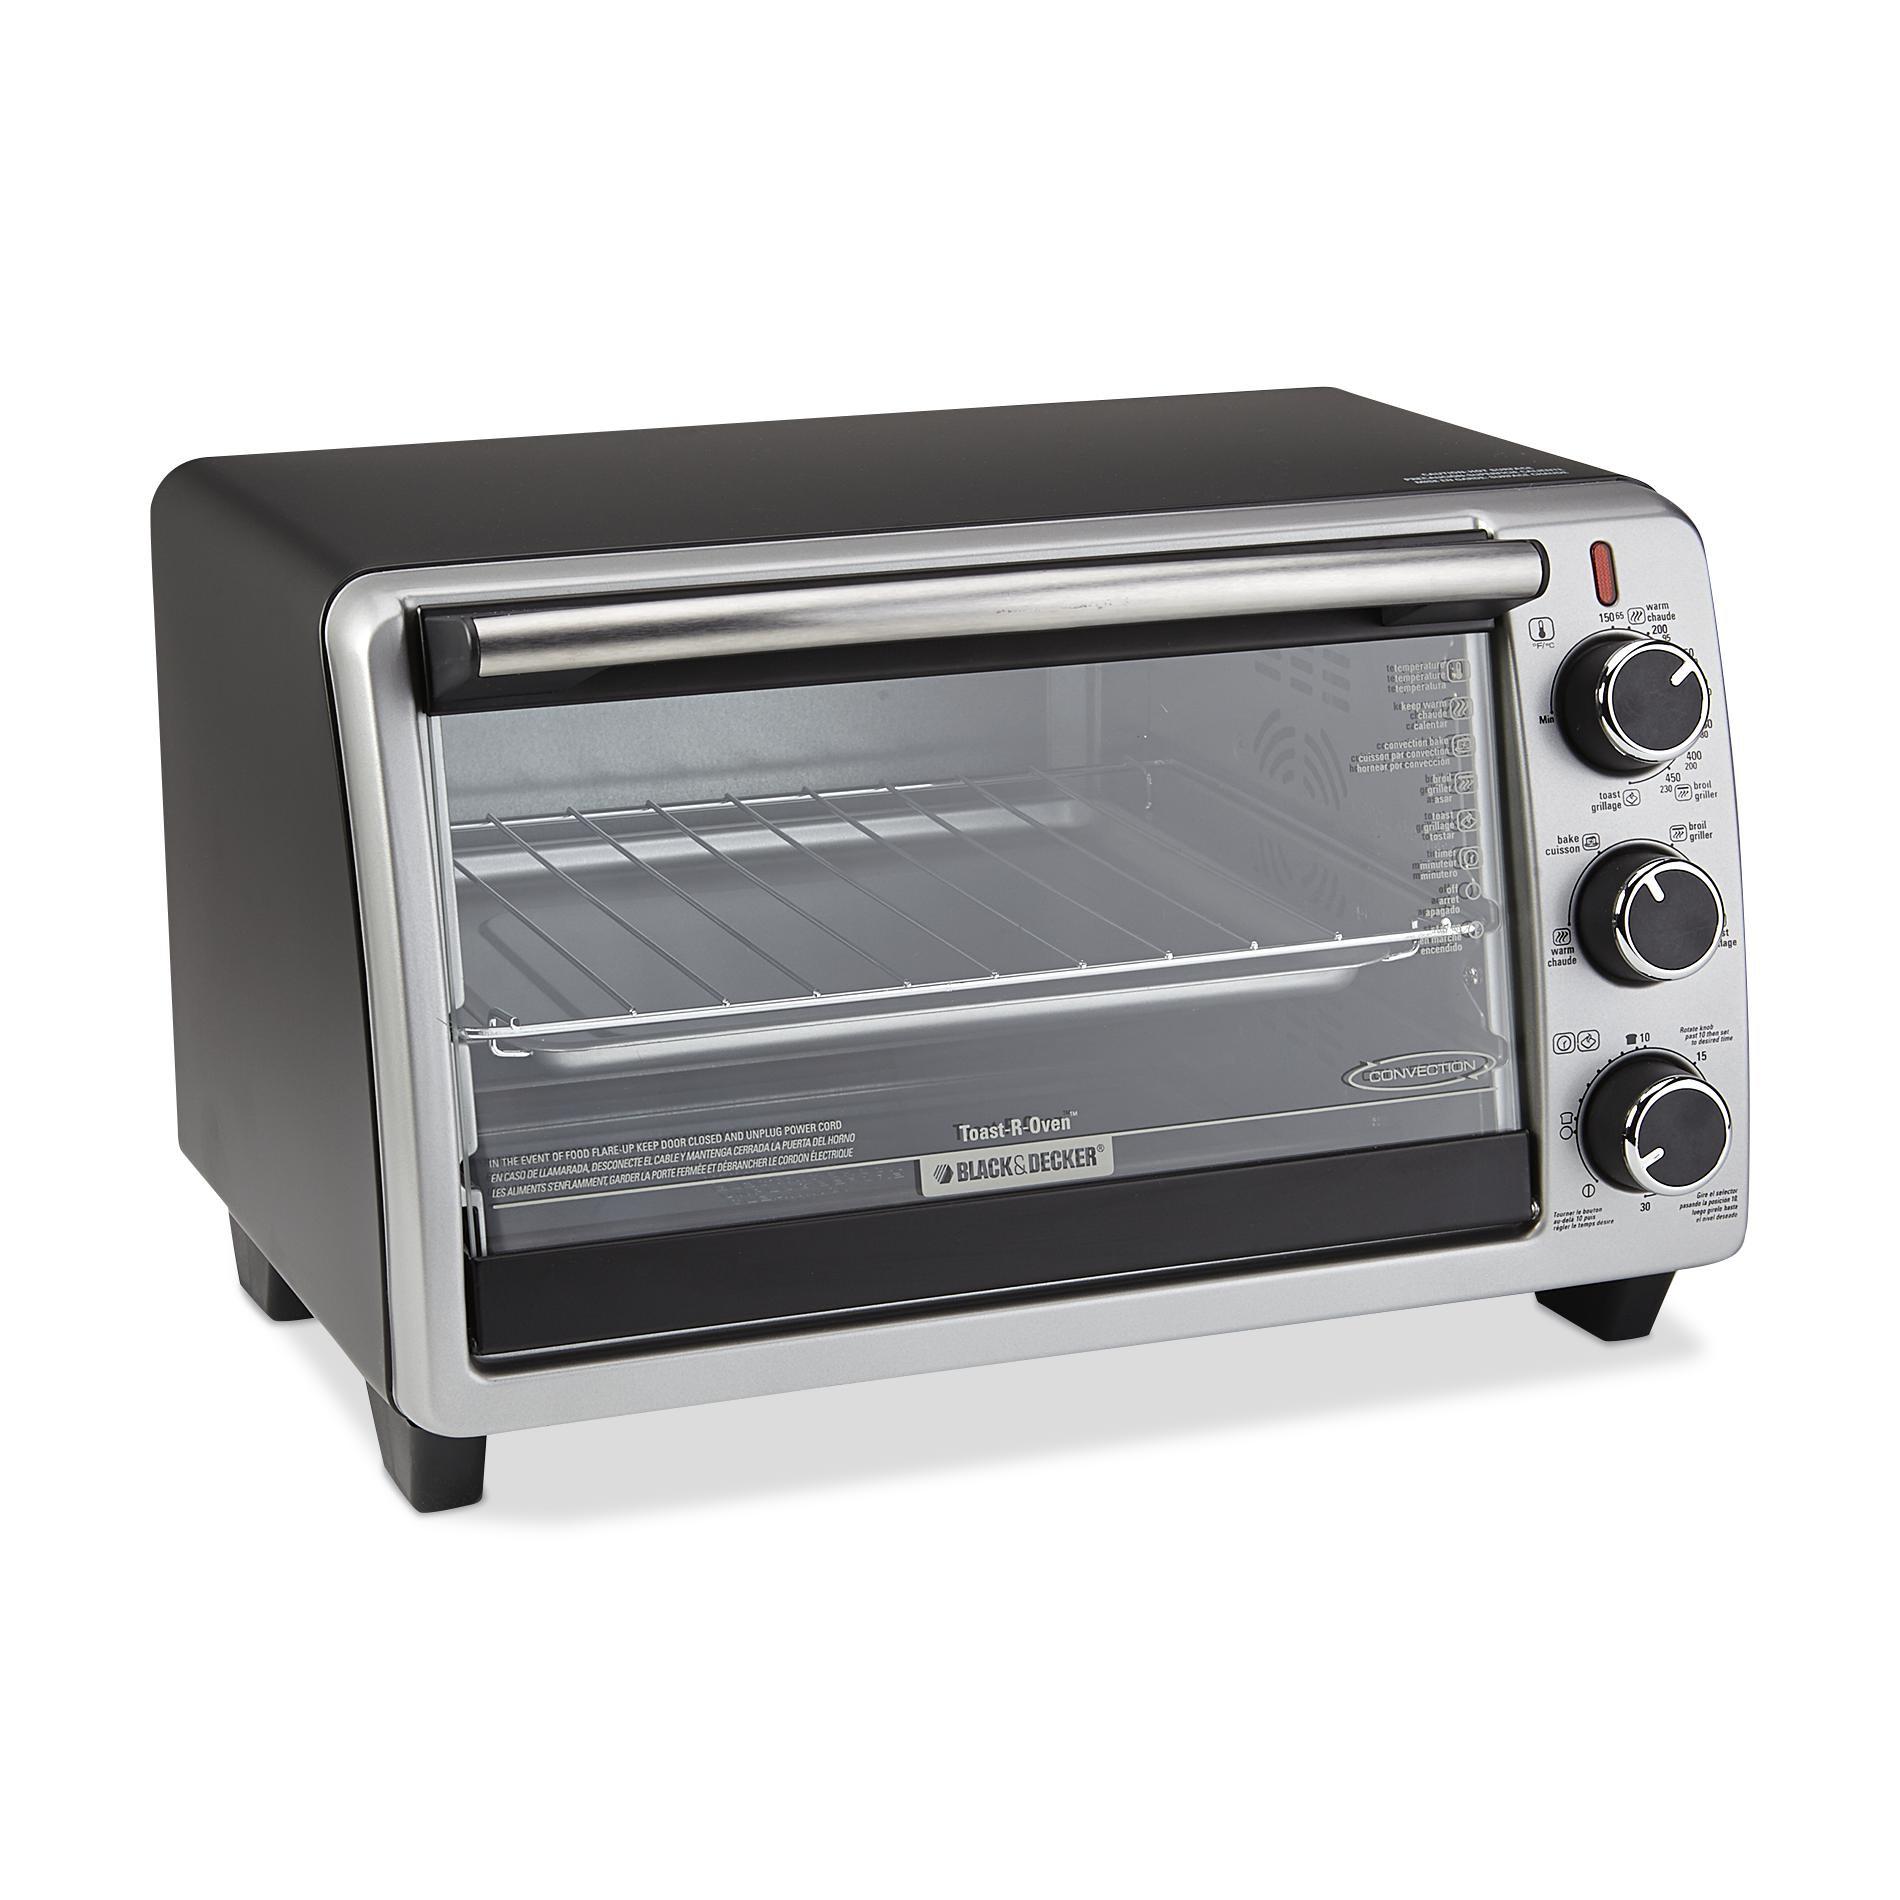 BLACK+DECKER TO1950SBD Convection Countertop Oven